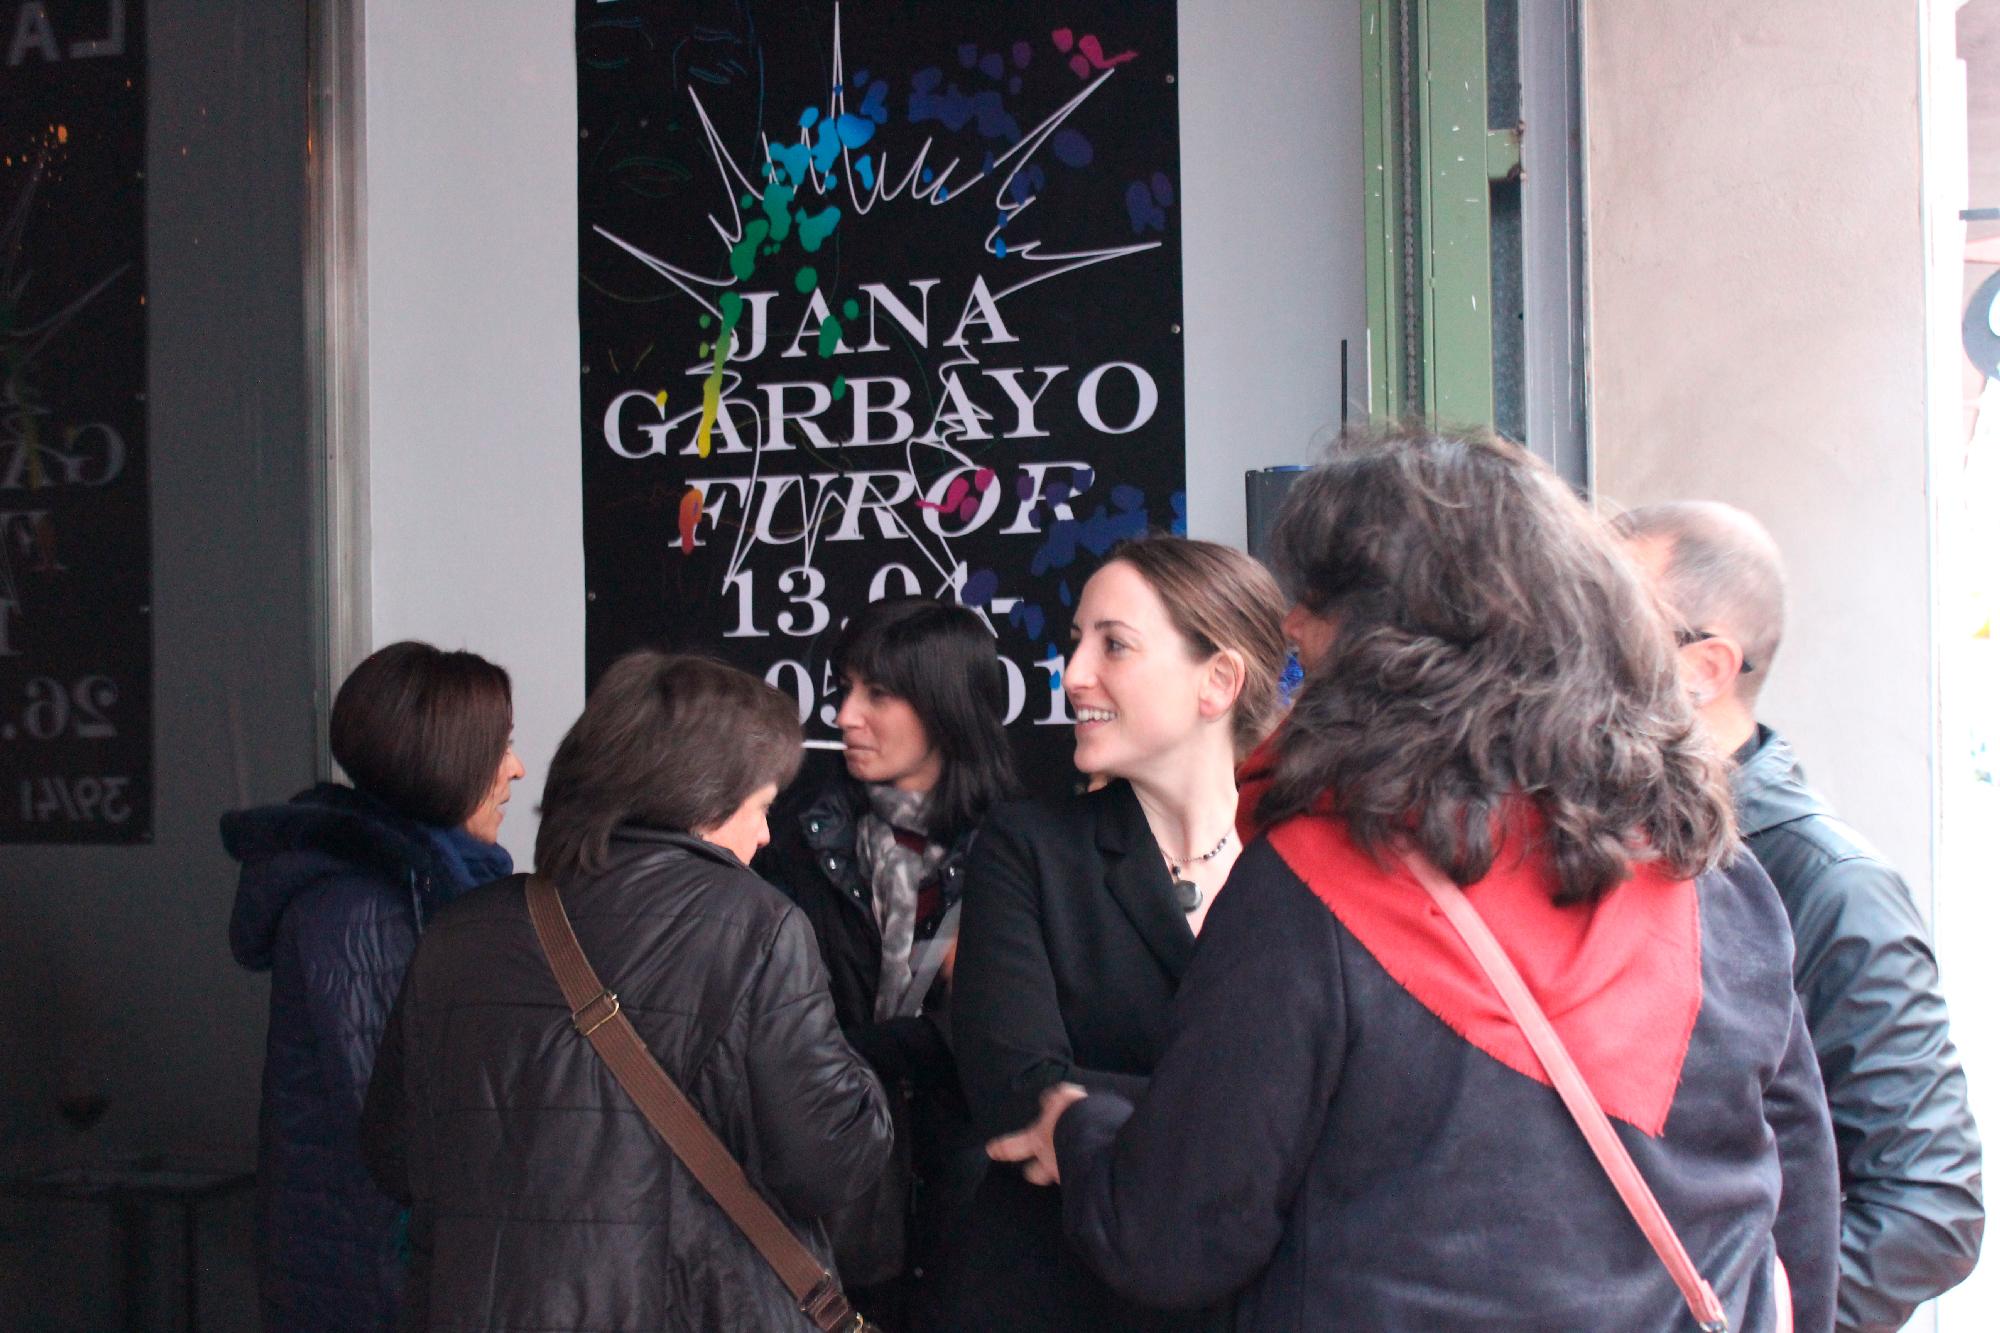 FUROR-JANA-GARBAYO032